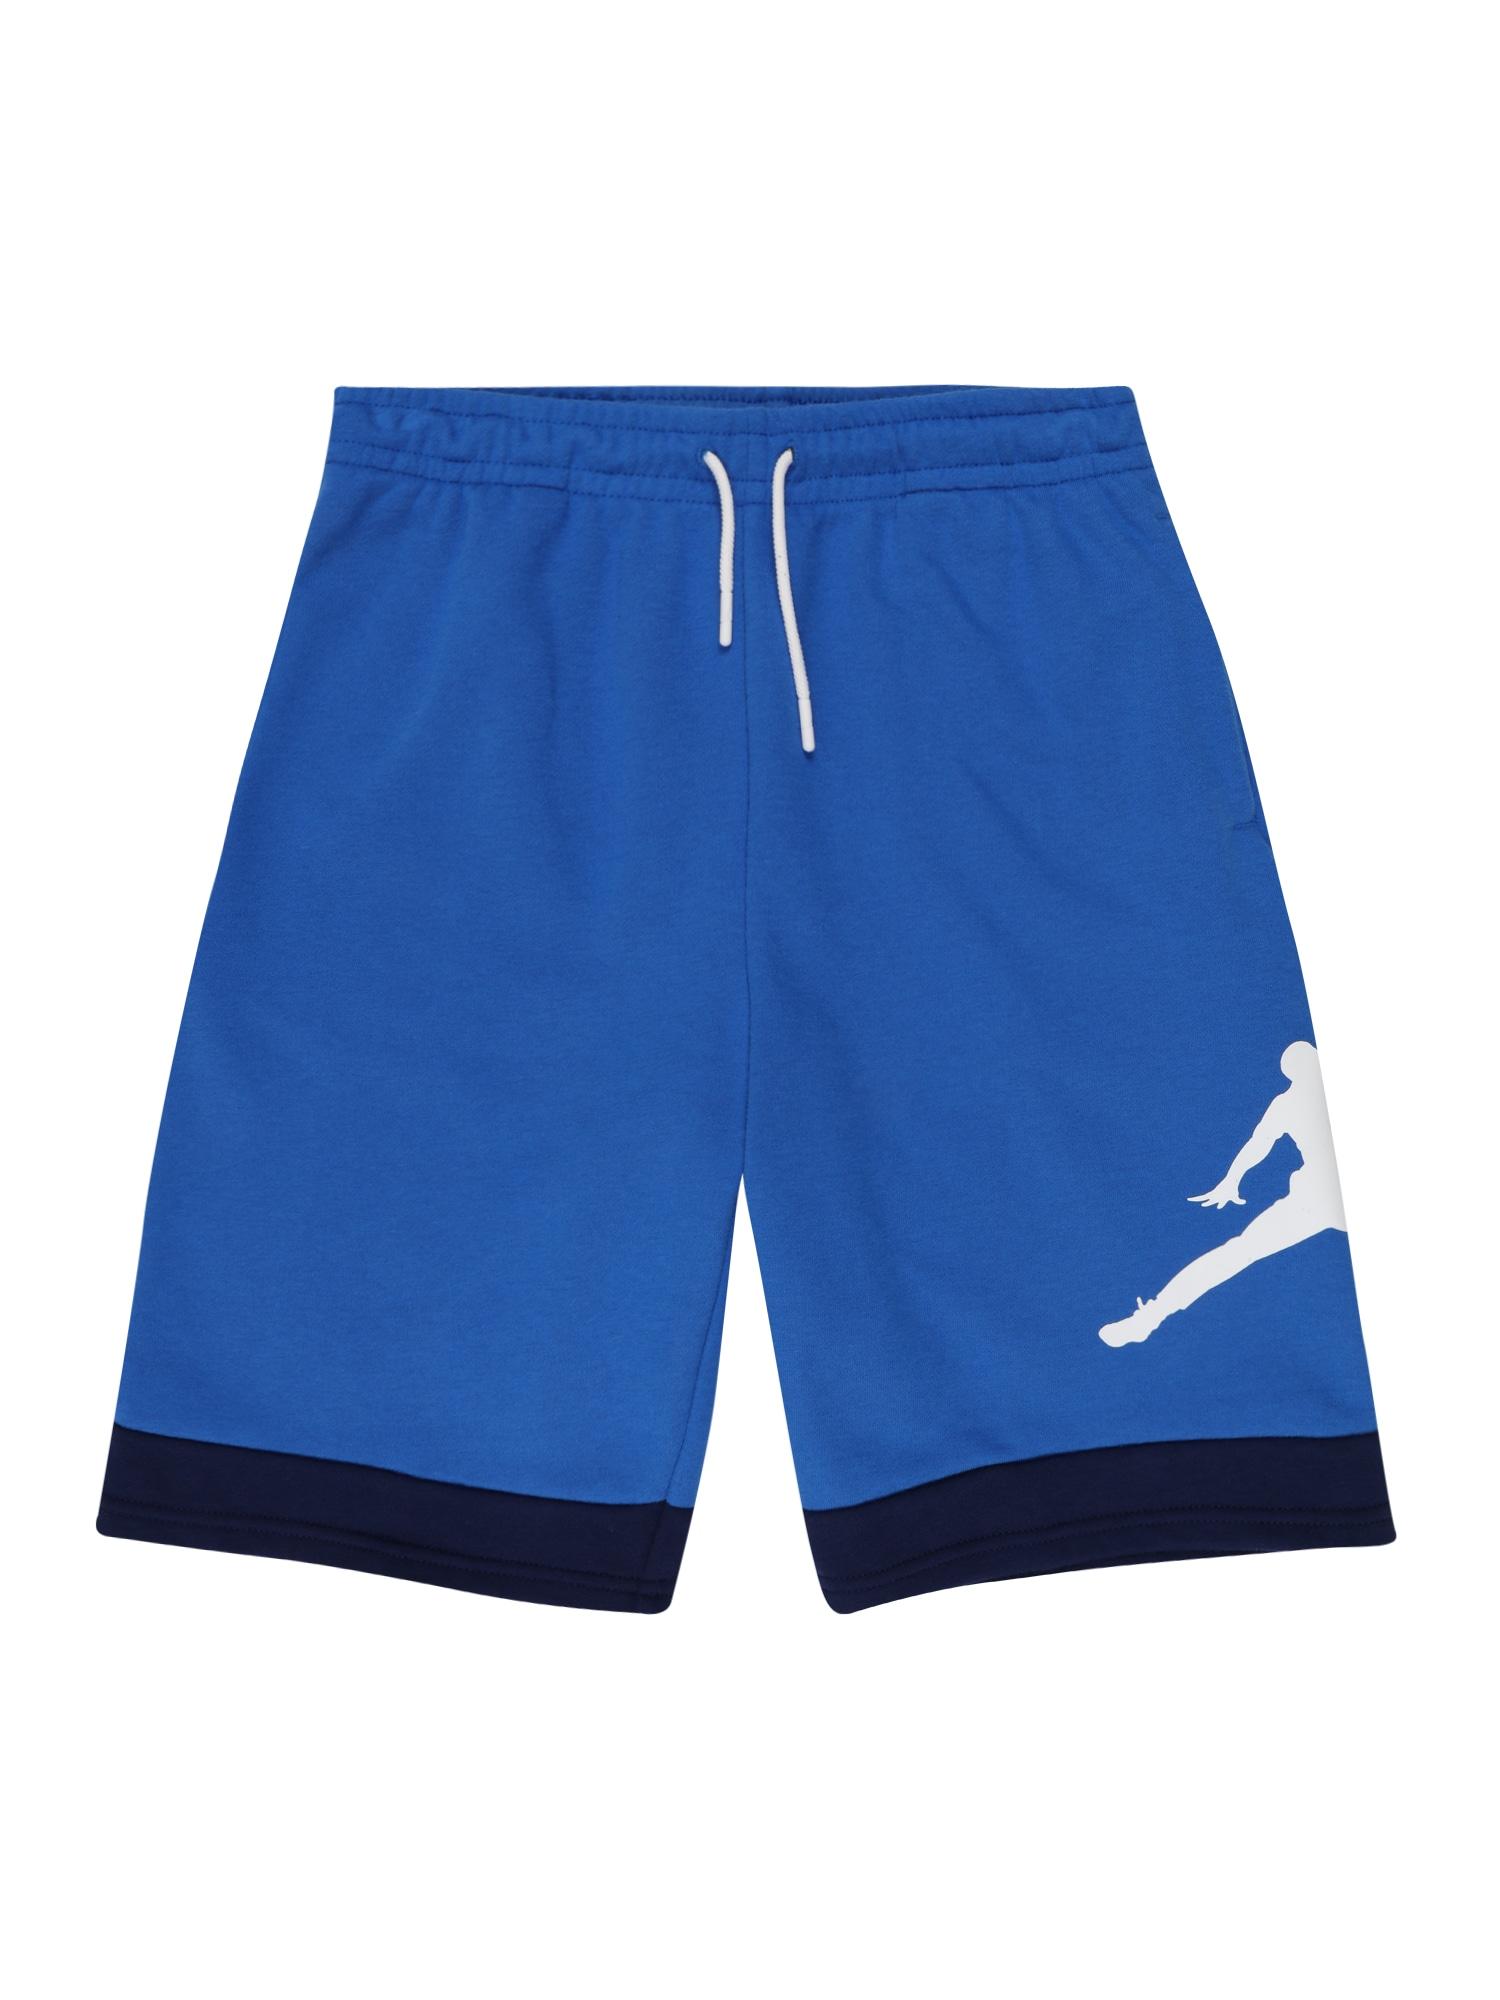 Jordan Kelnės mėlyna / tamsiai mėlyna / balta